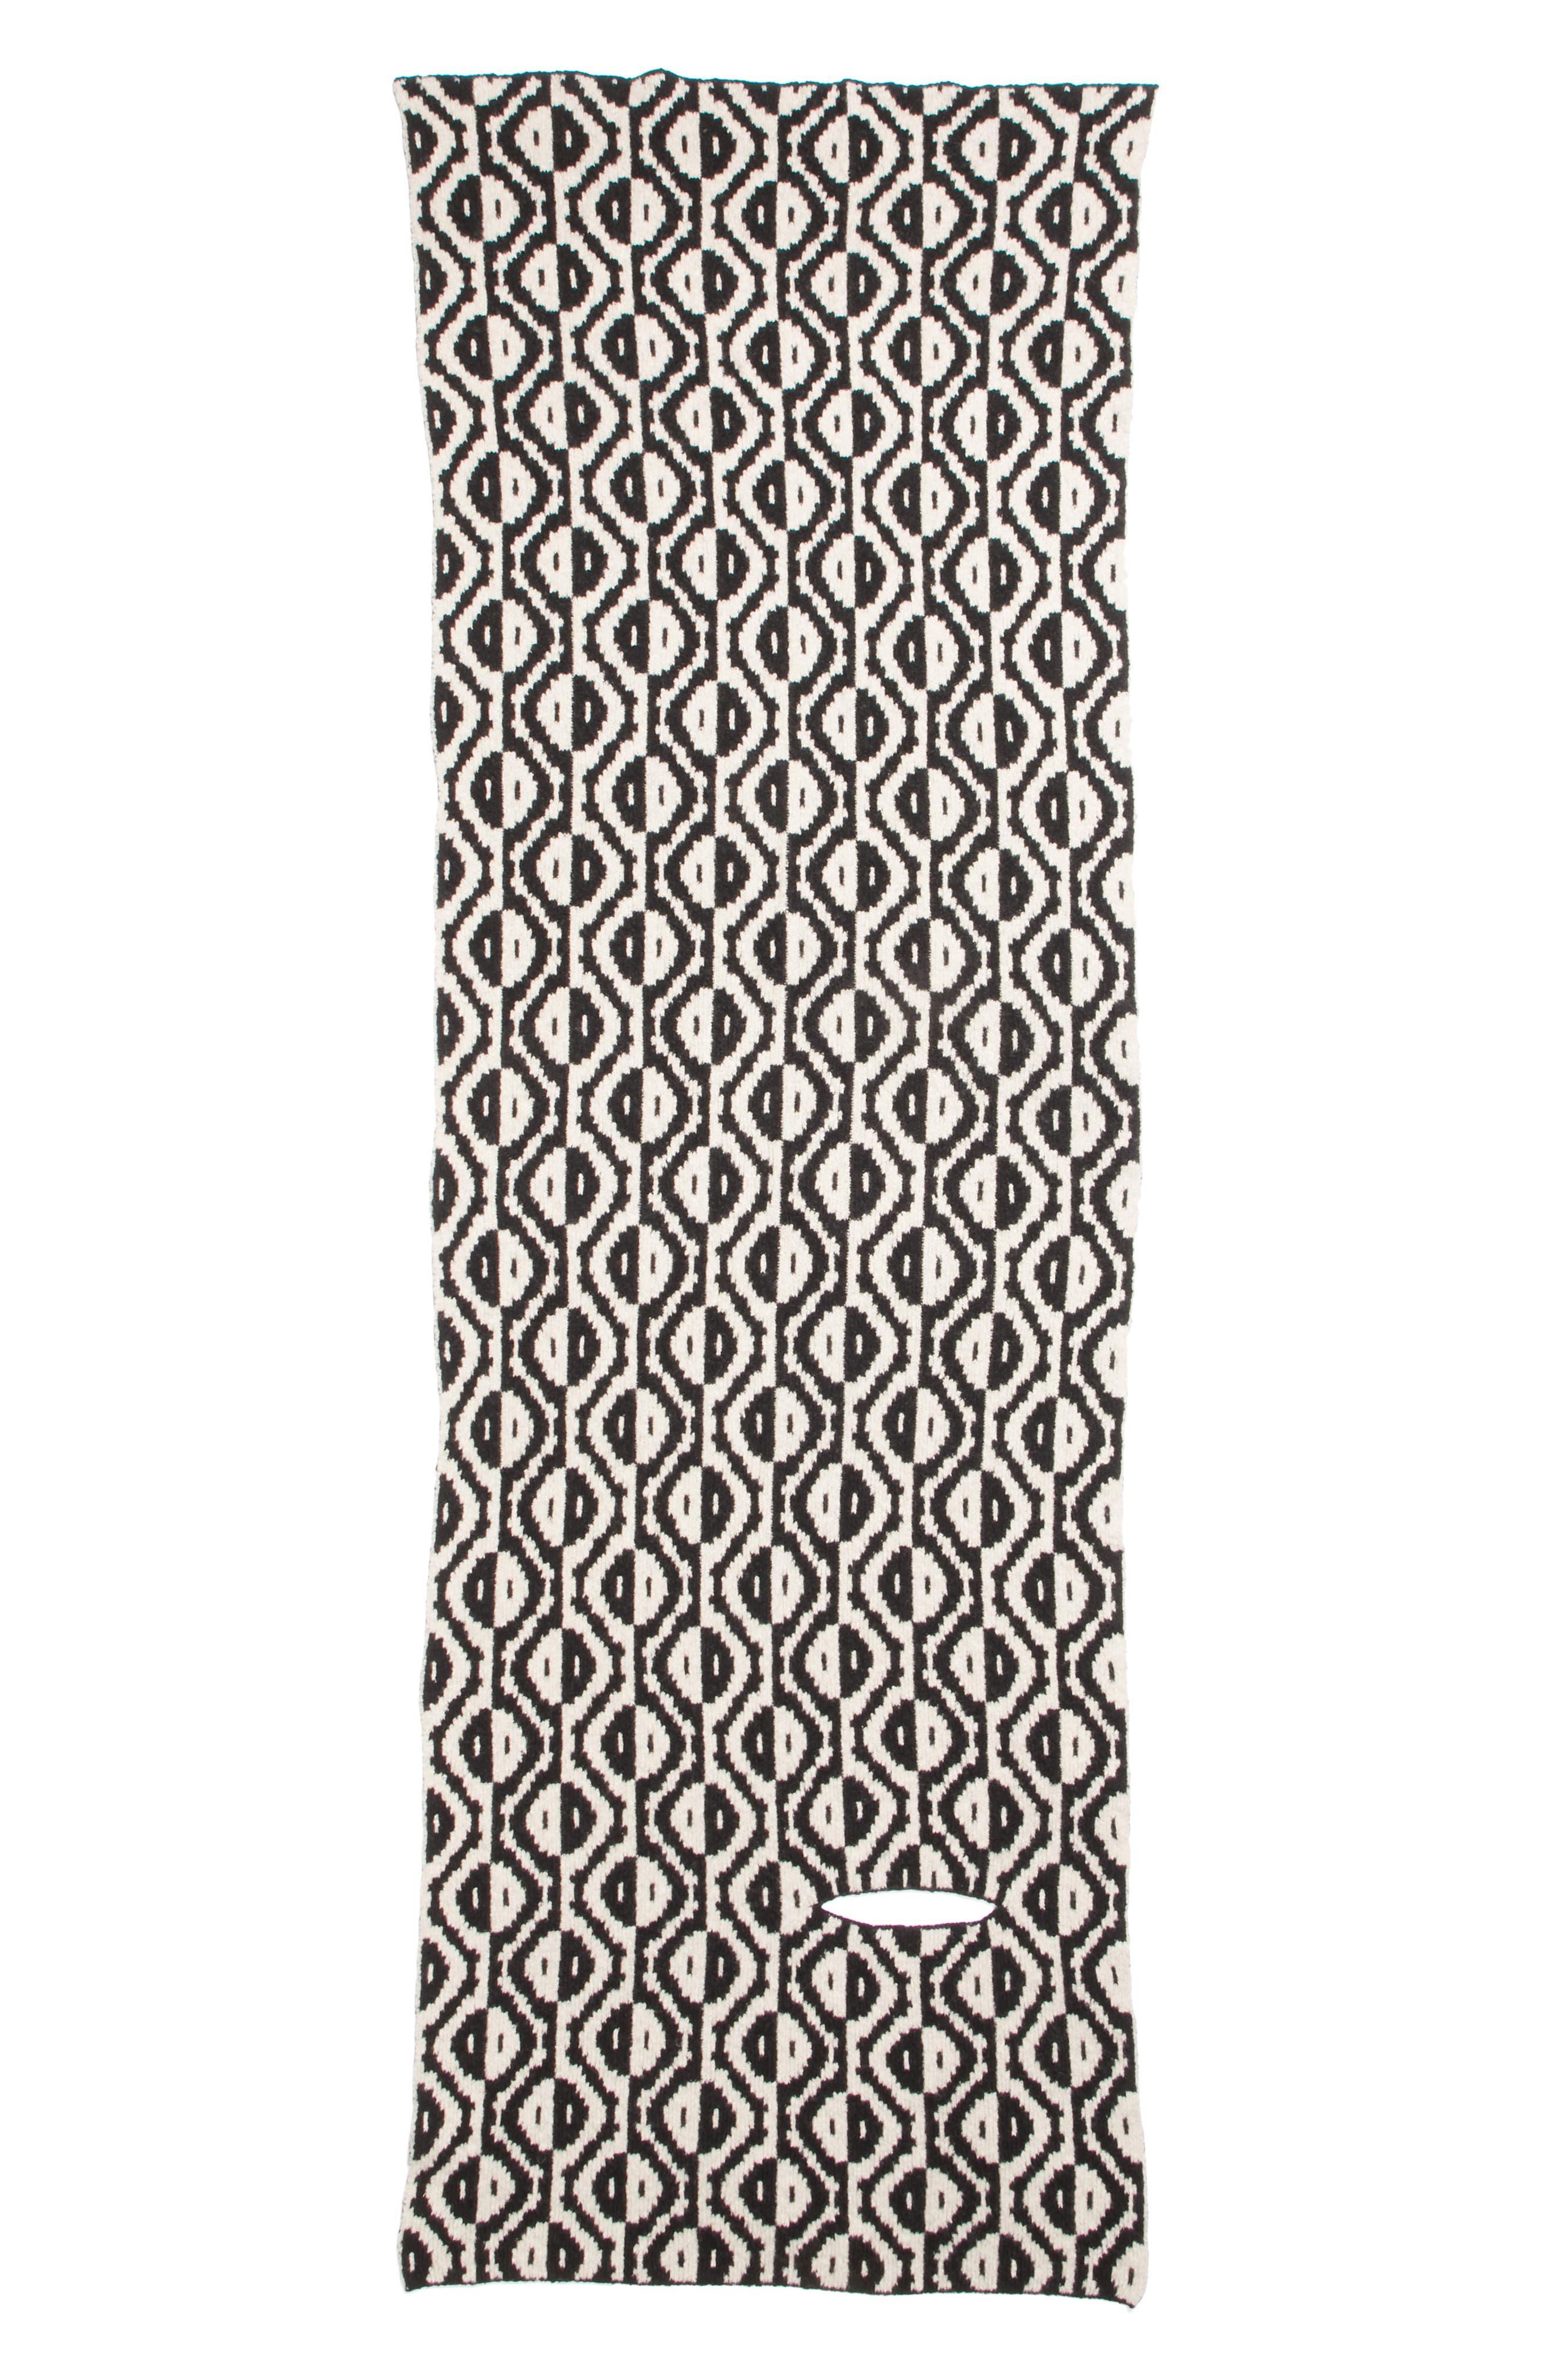 Geo Jacquard Merino Wool Blend Scarf,                             Main thumbnail 1, color,                             BLACK